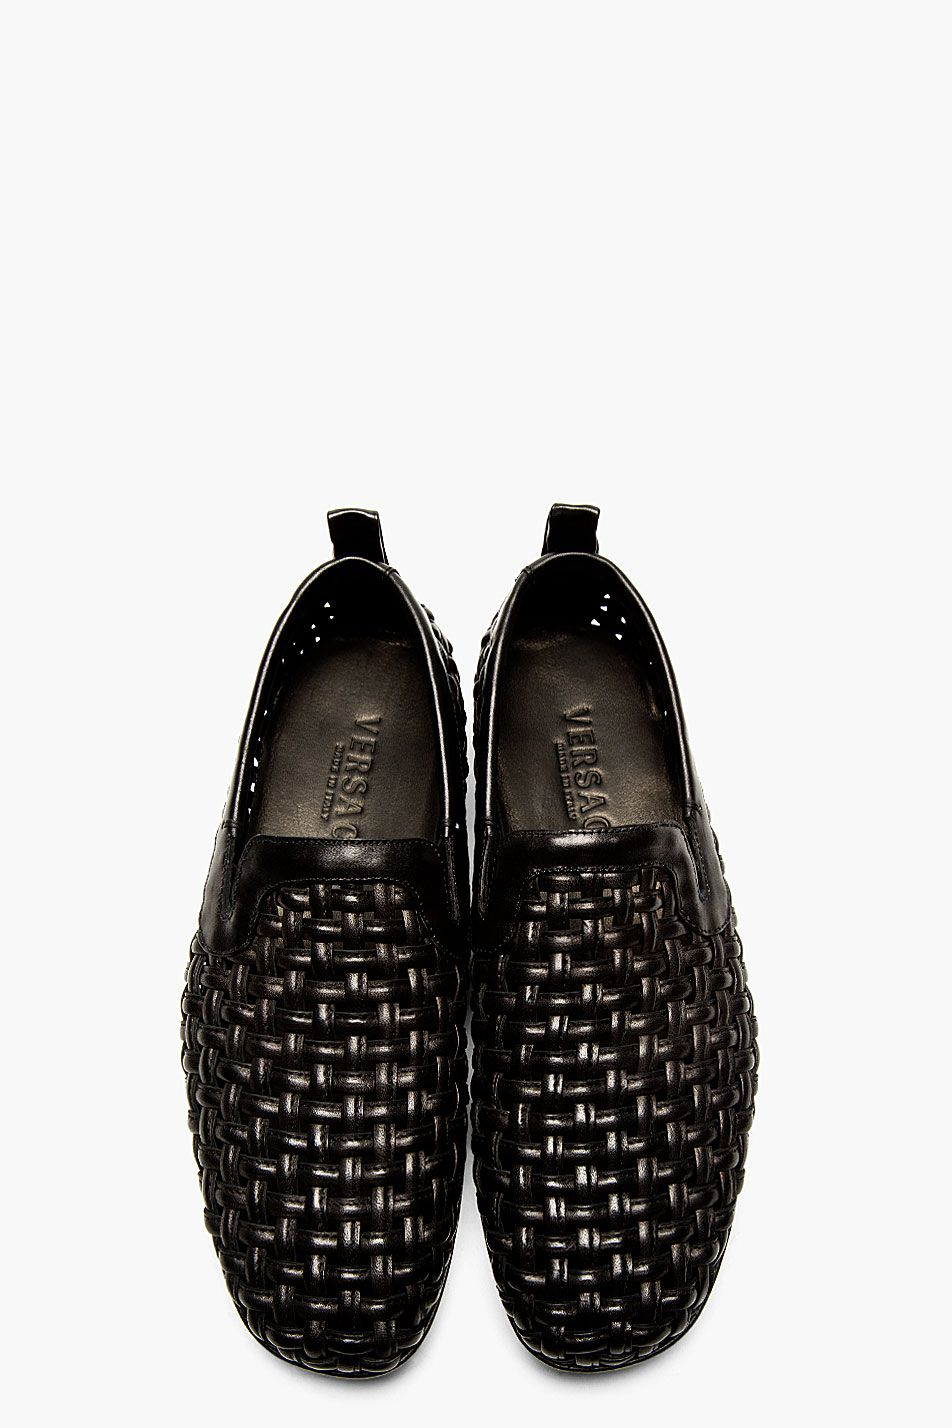 VERSACE Black Leather Basket Weave Loafers   Shoe Style   Pinterest ... da093d9cbb1